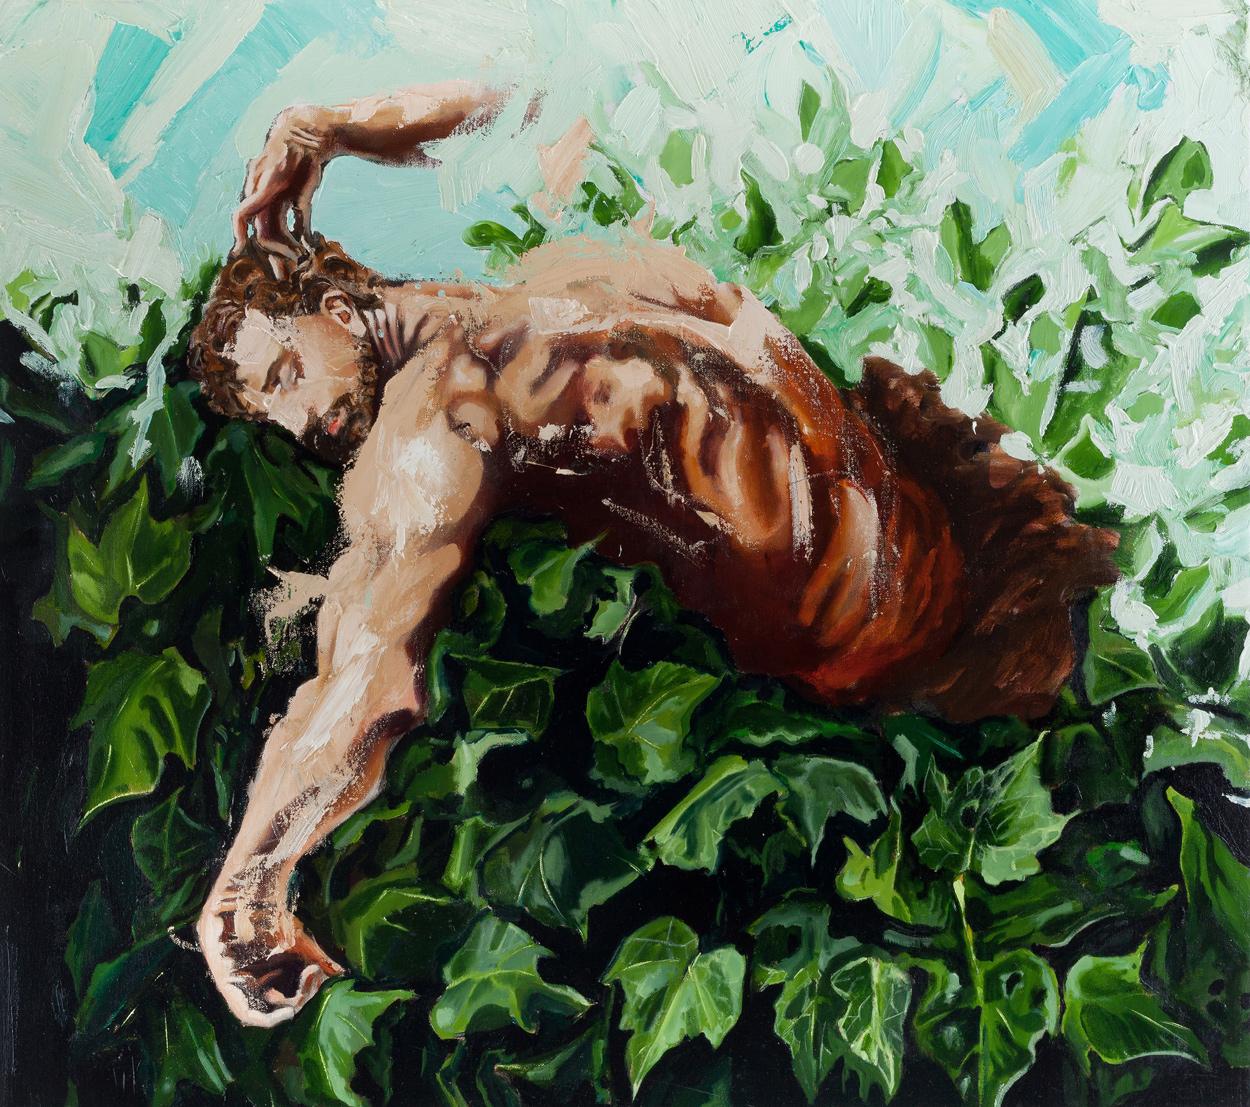 Ivy Samson I, Oil on canvas, 80x90 cm,2013